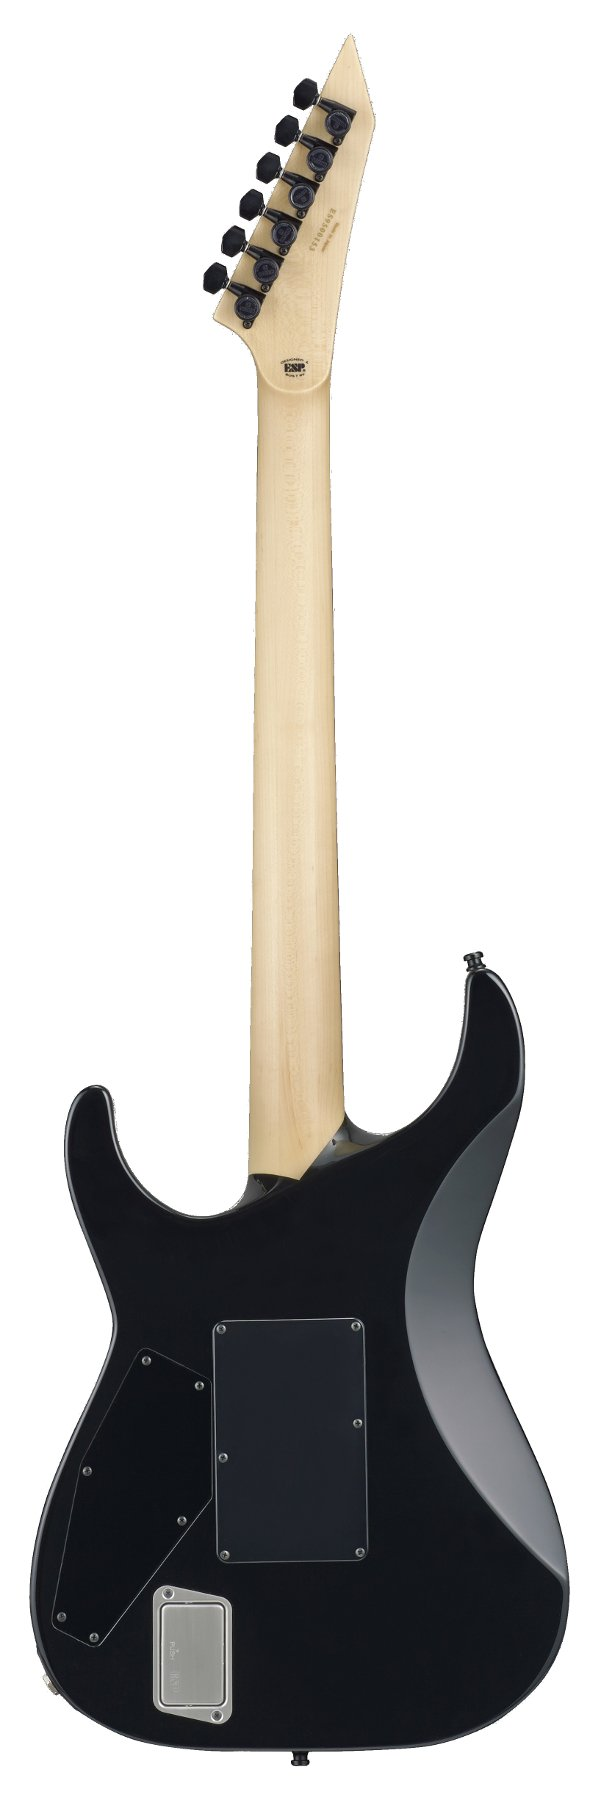 Electric Guitar, Black